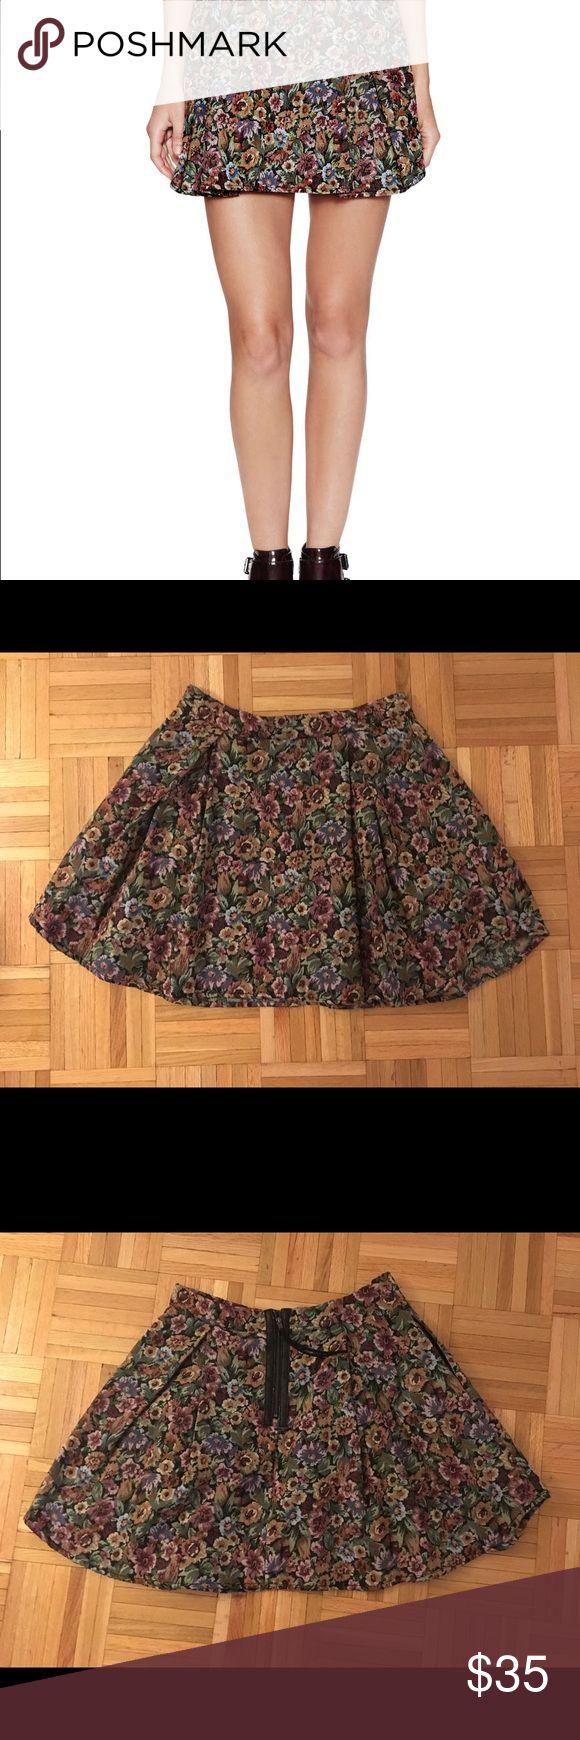 BCBGeneration Floral Mini Skirt Mini skirt with floral design on a black background in medium! BCBGeneration Skirts Mini